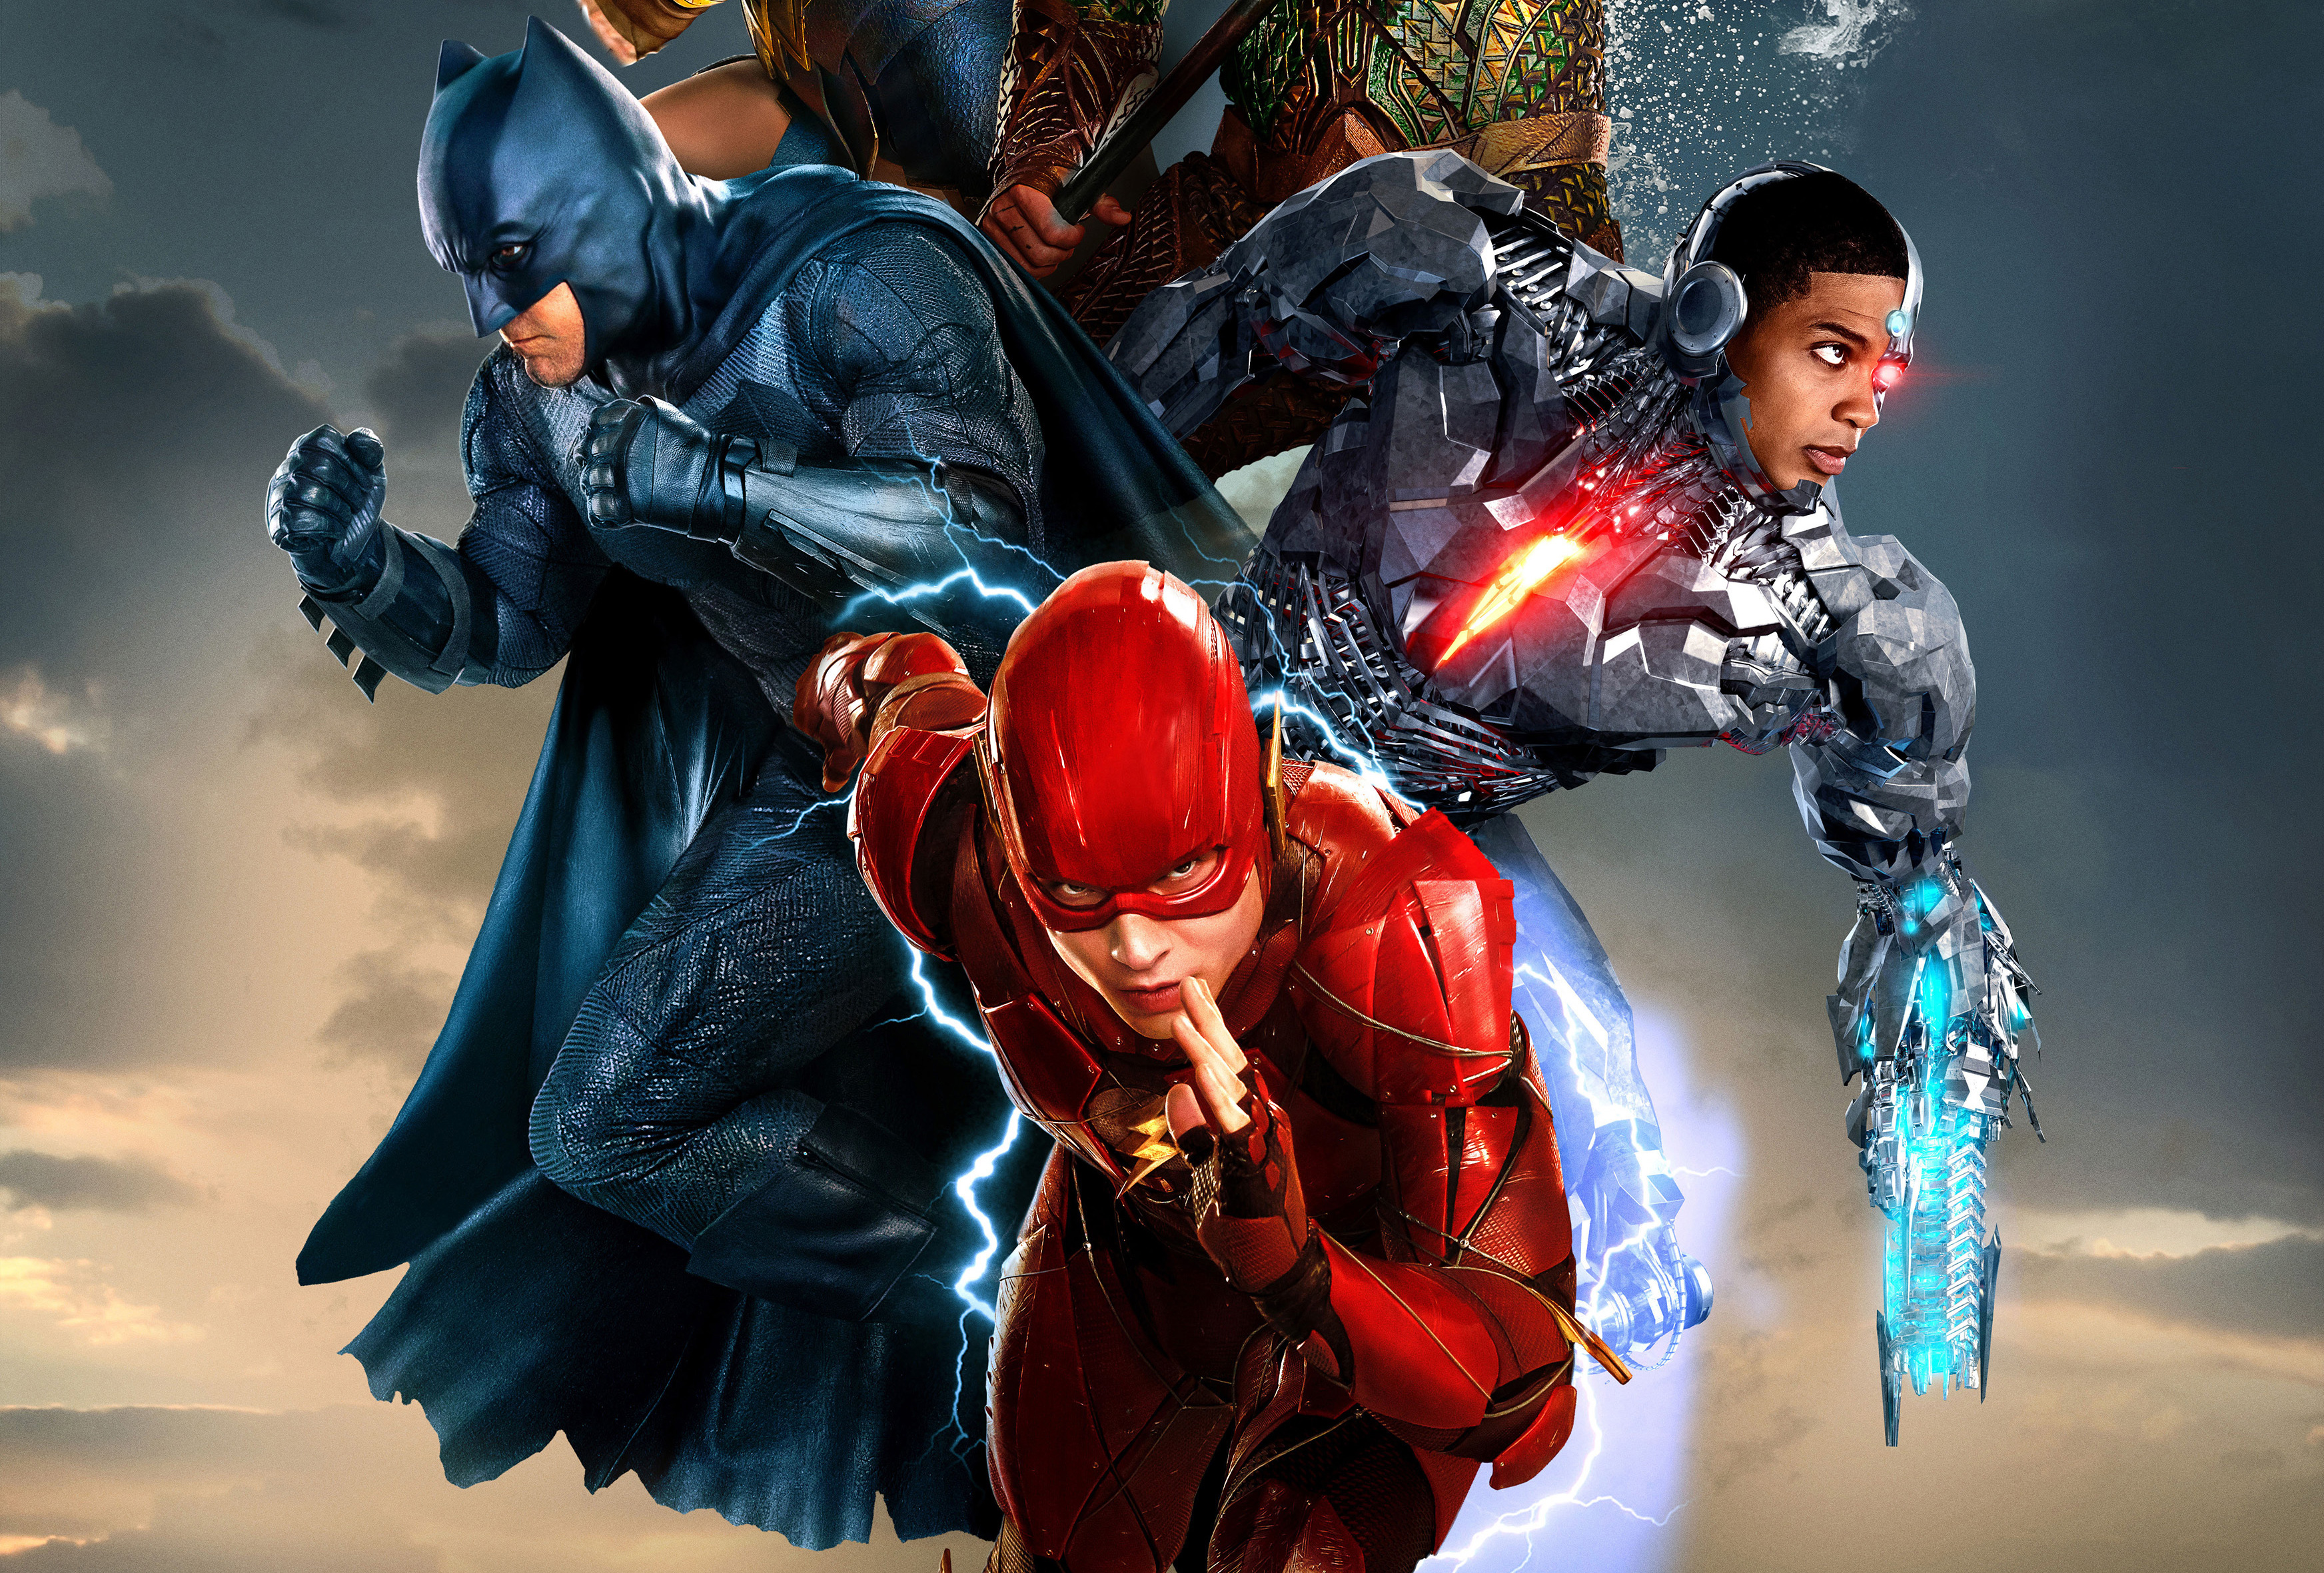 Justice League 2017 Movie 4k Hd Desktop Wallpaper For 4k: 2048x1152 4k Justice League 2048x1152 Resolution HD 4k